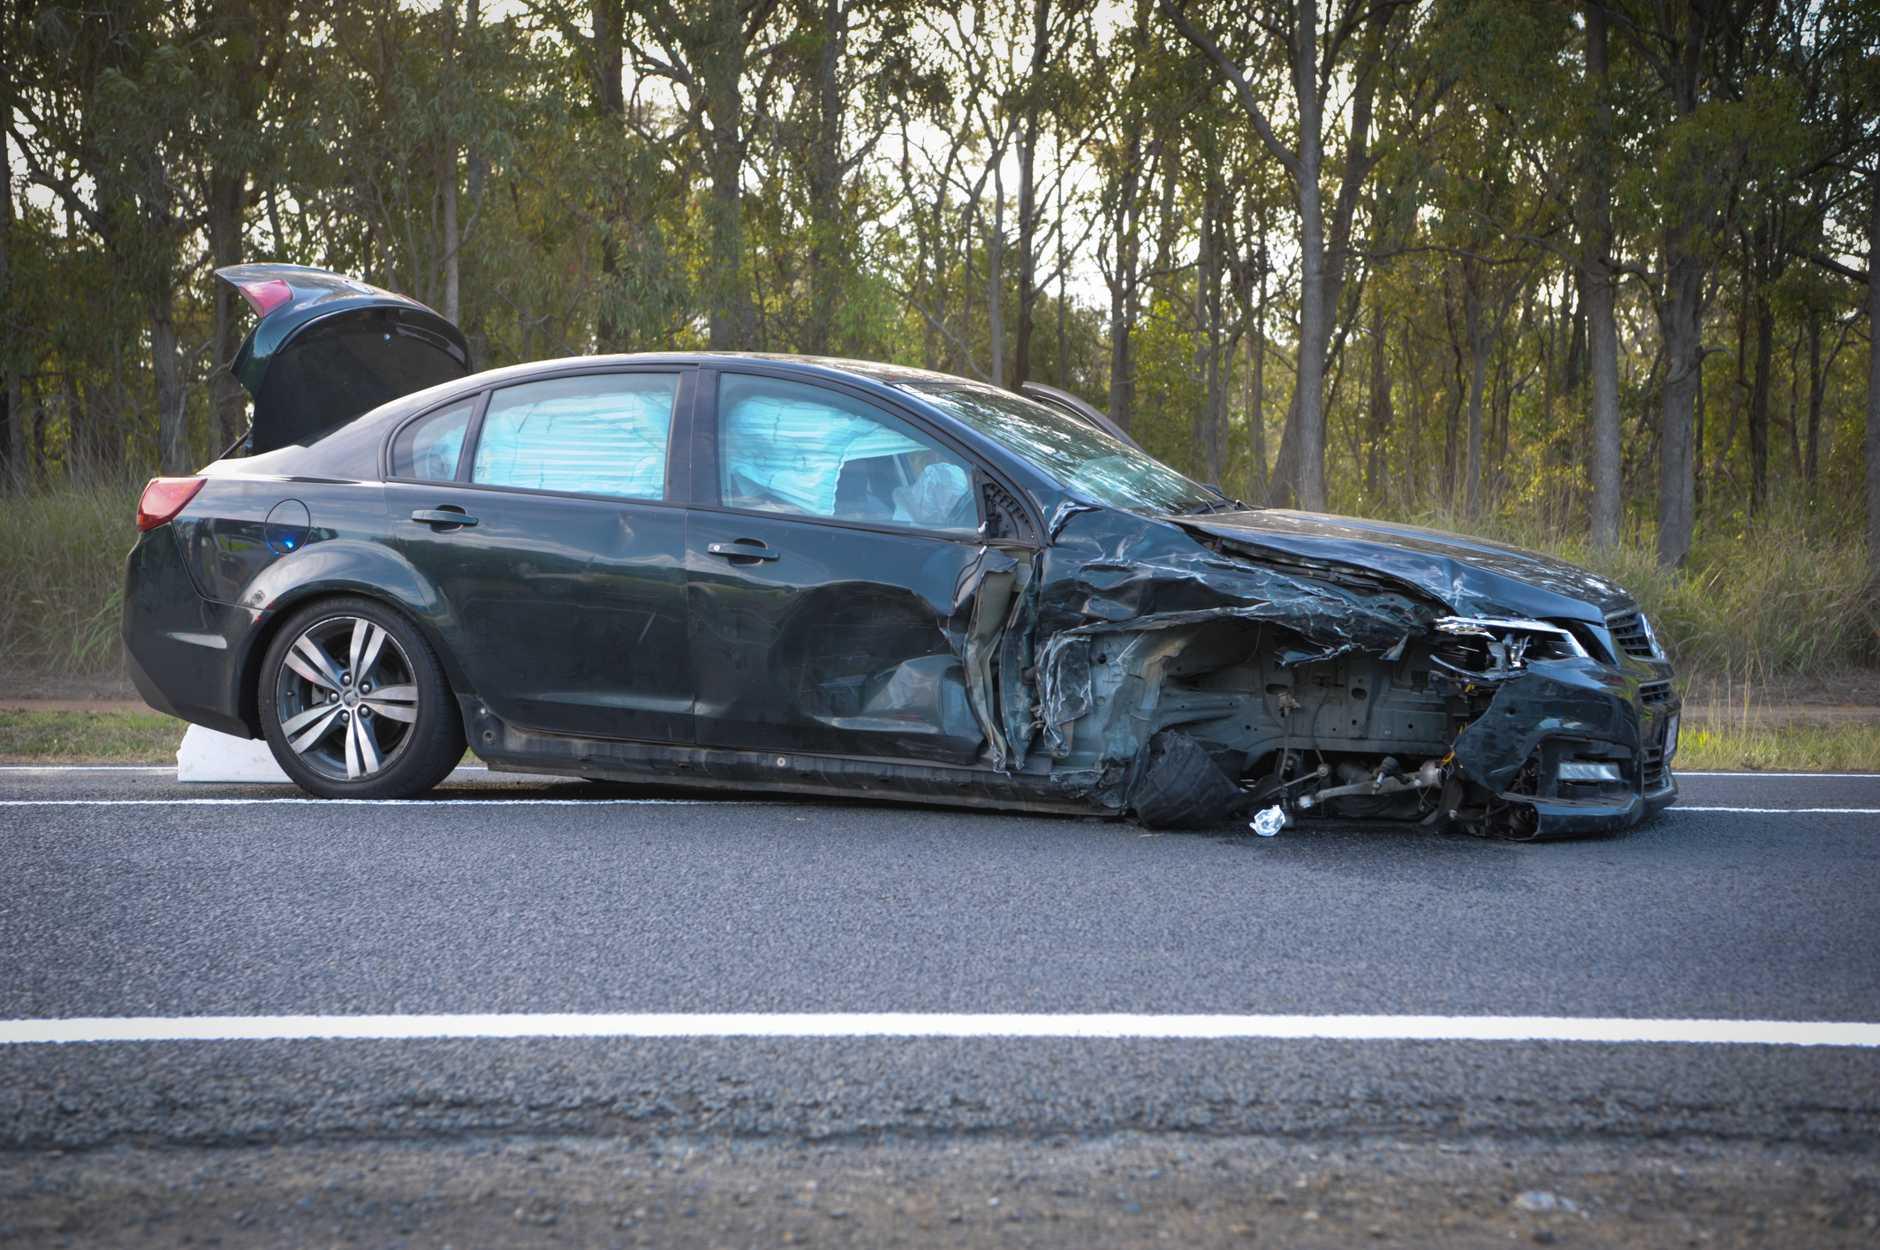 ALLOWAY: A three-vehicle crash involving ten people has taken place on Goodwood Rd south of Bundaberg.